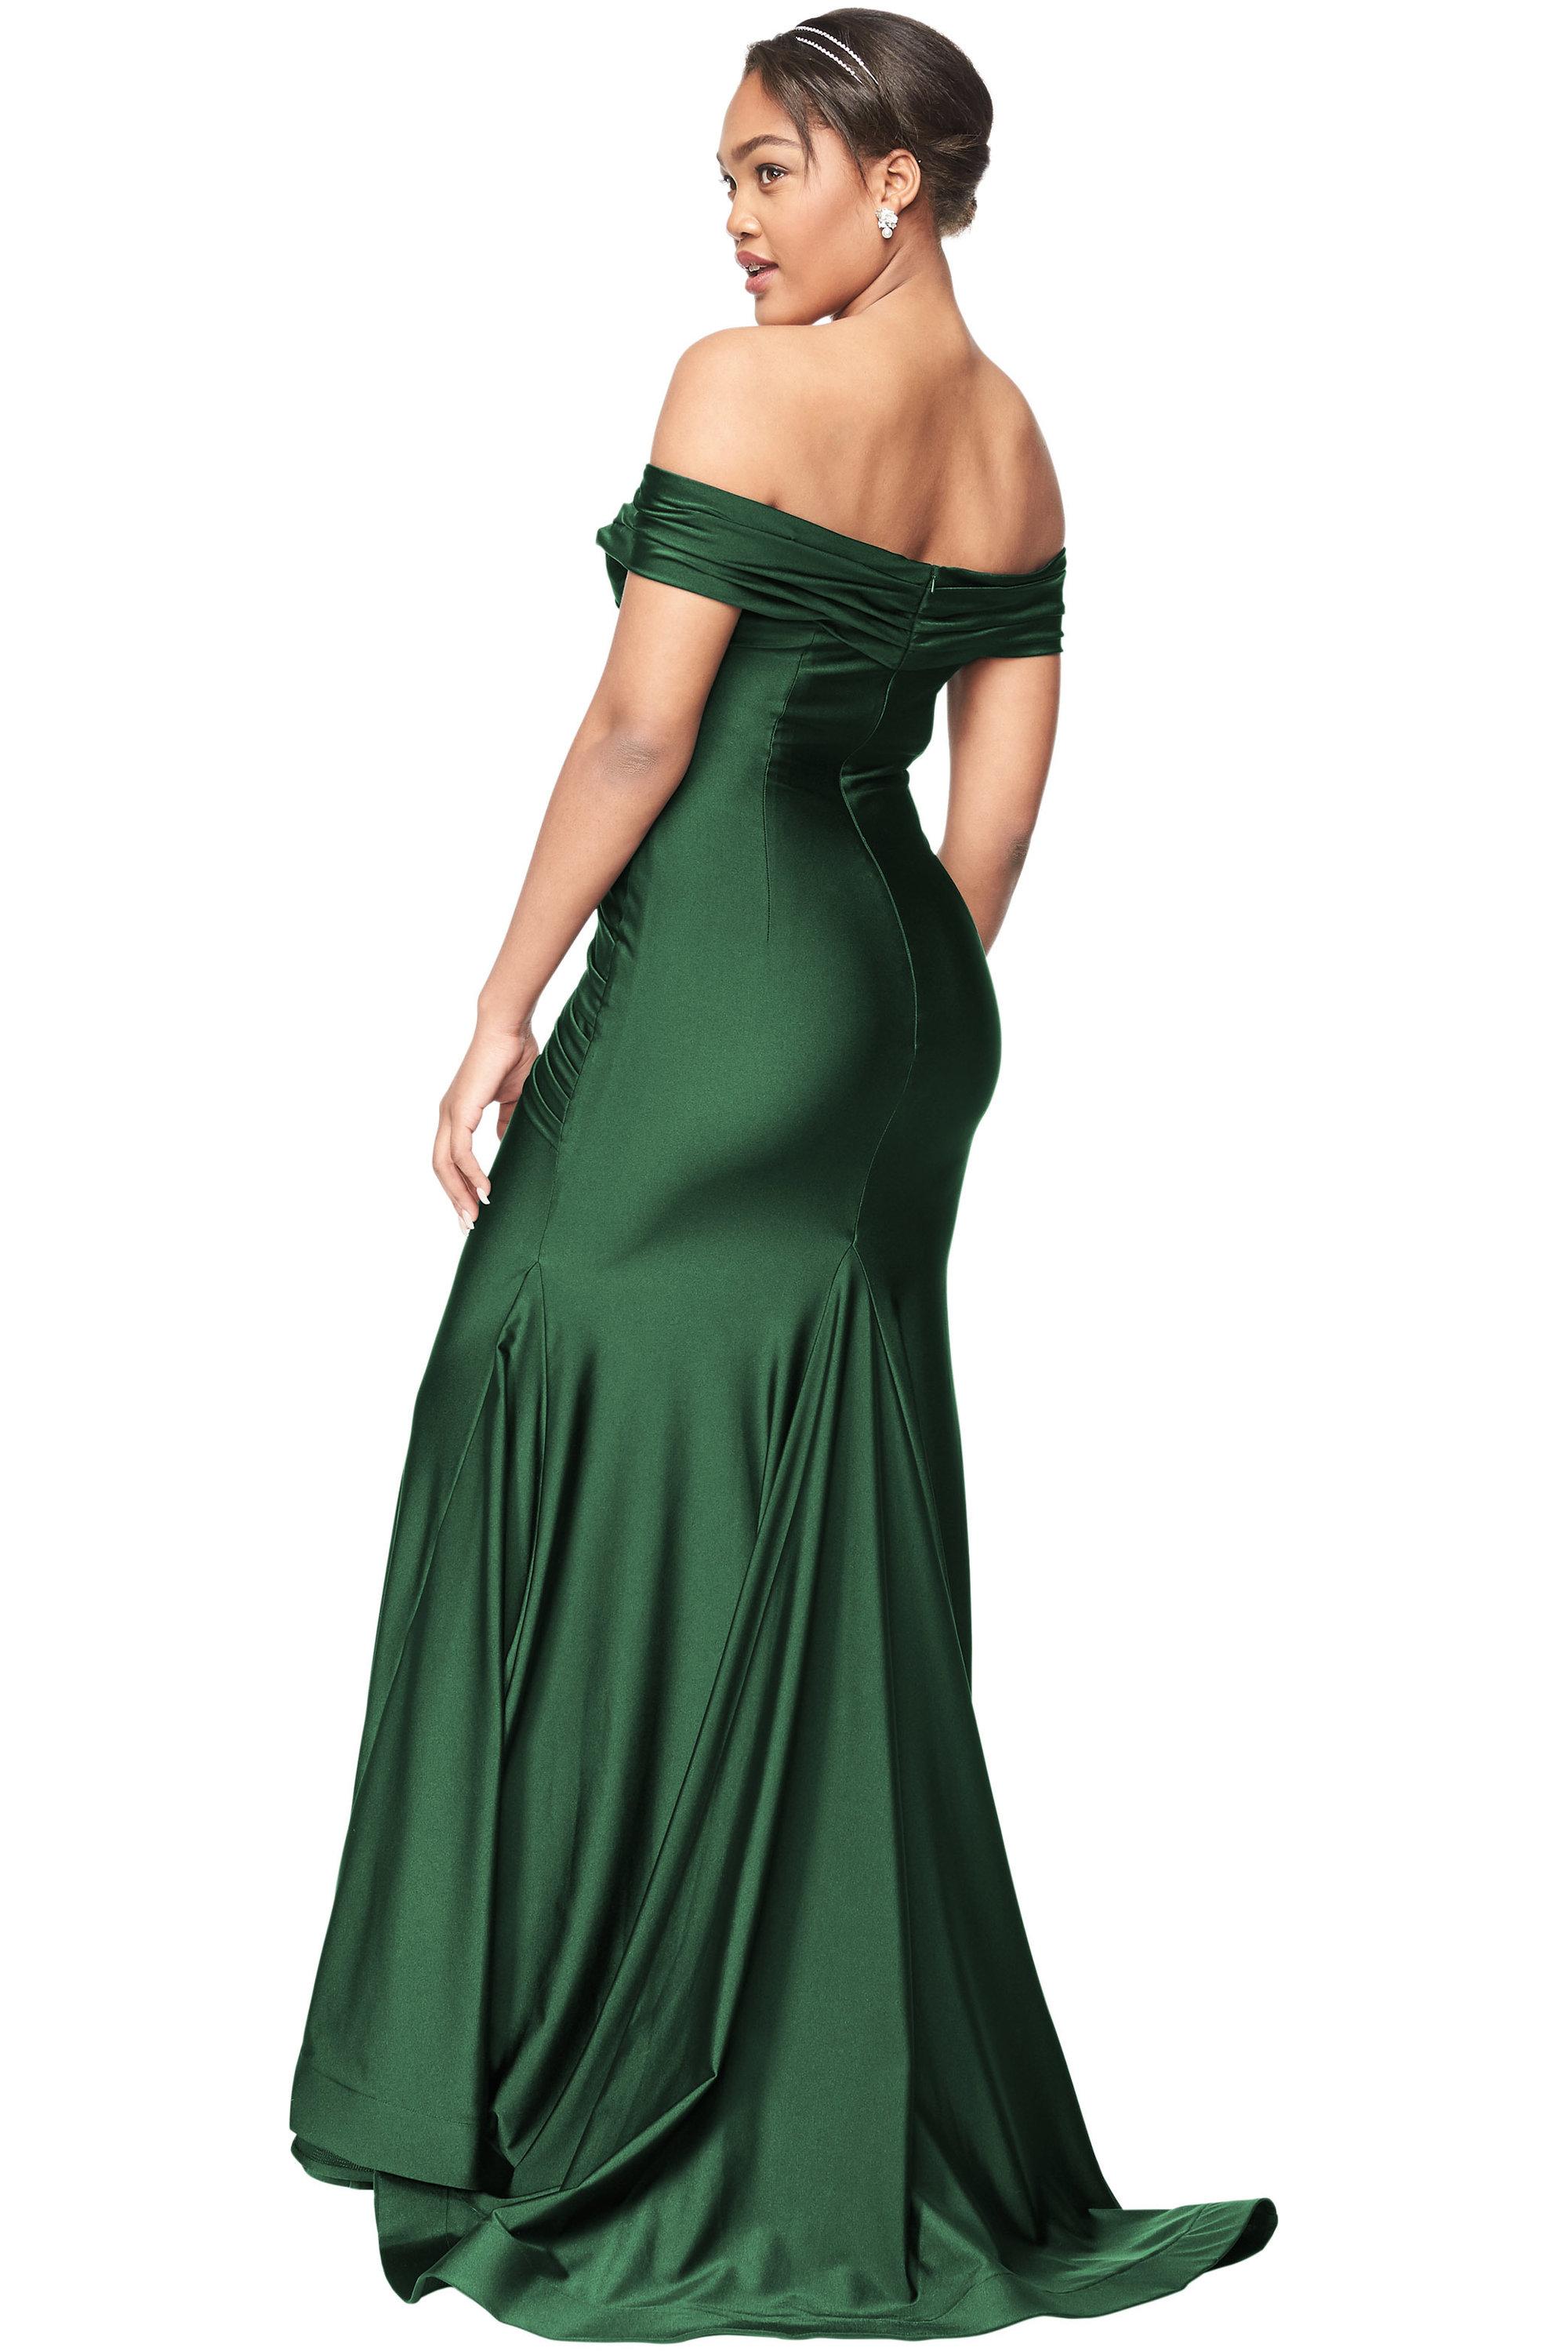 Bill Levkoff HUNTER Stretch Satin Off The Shoulder Mermaid gown, $280.00 Back